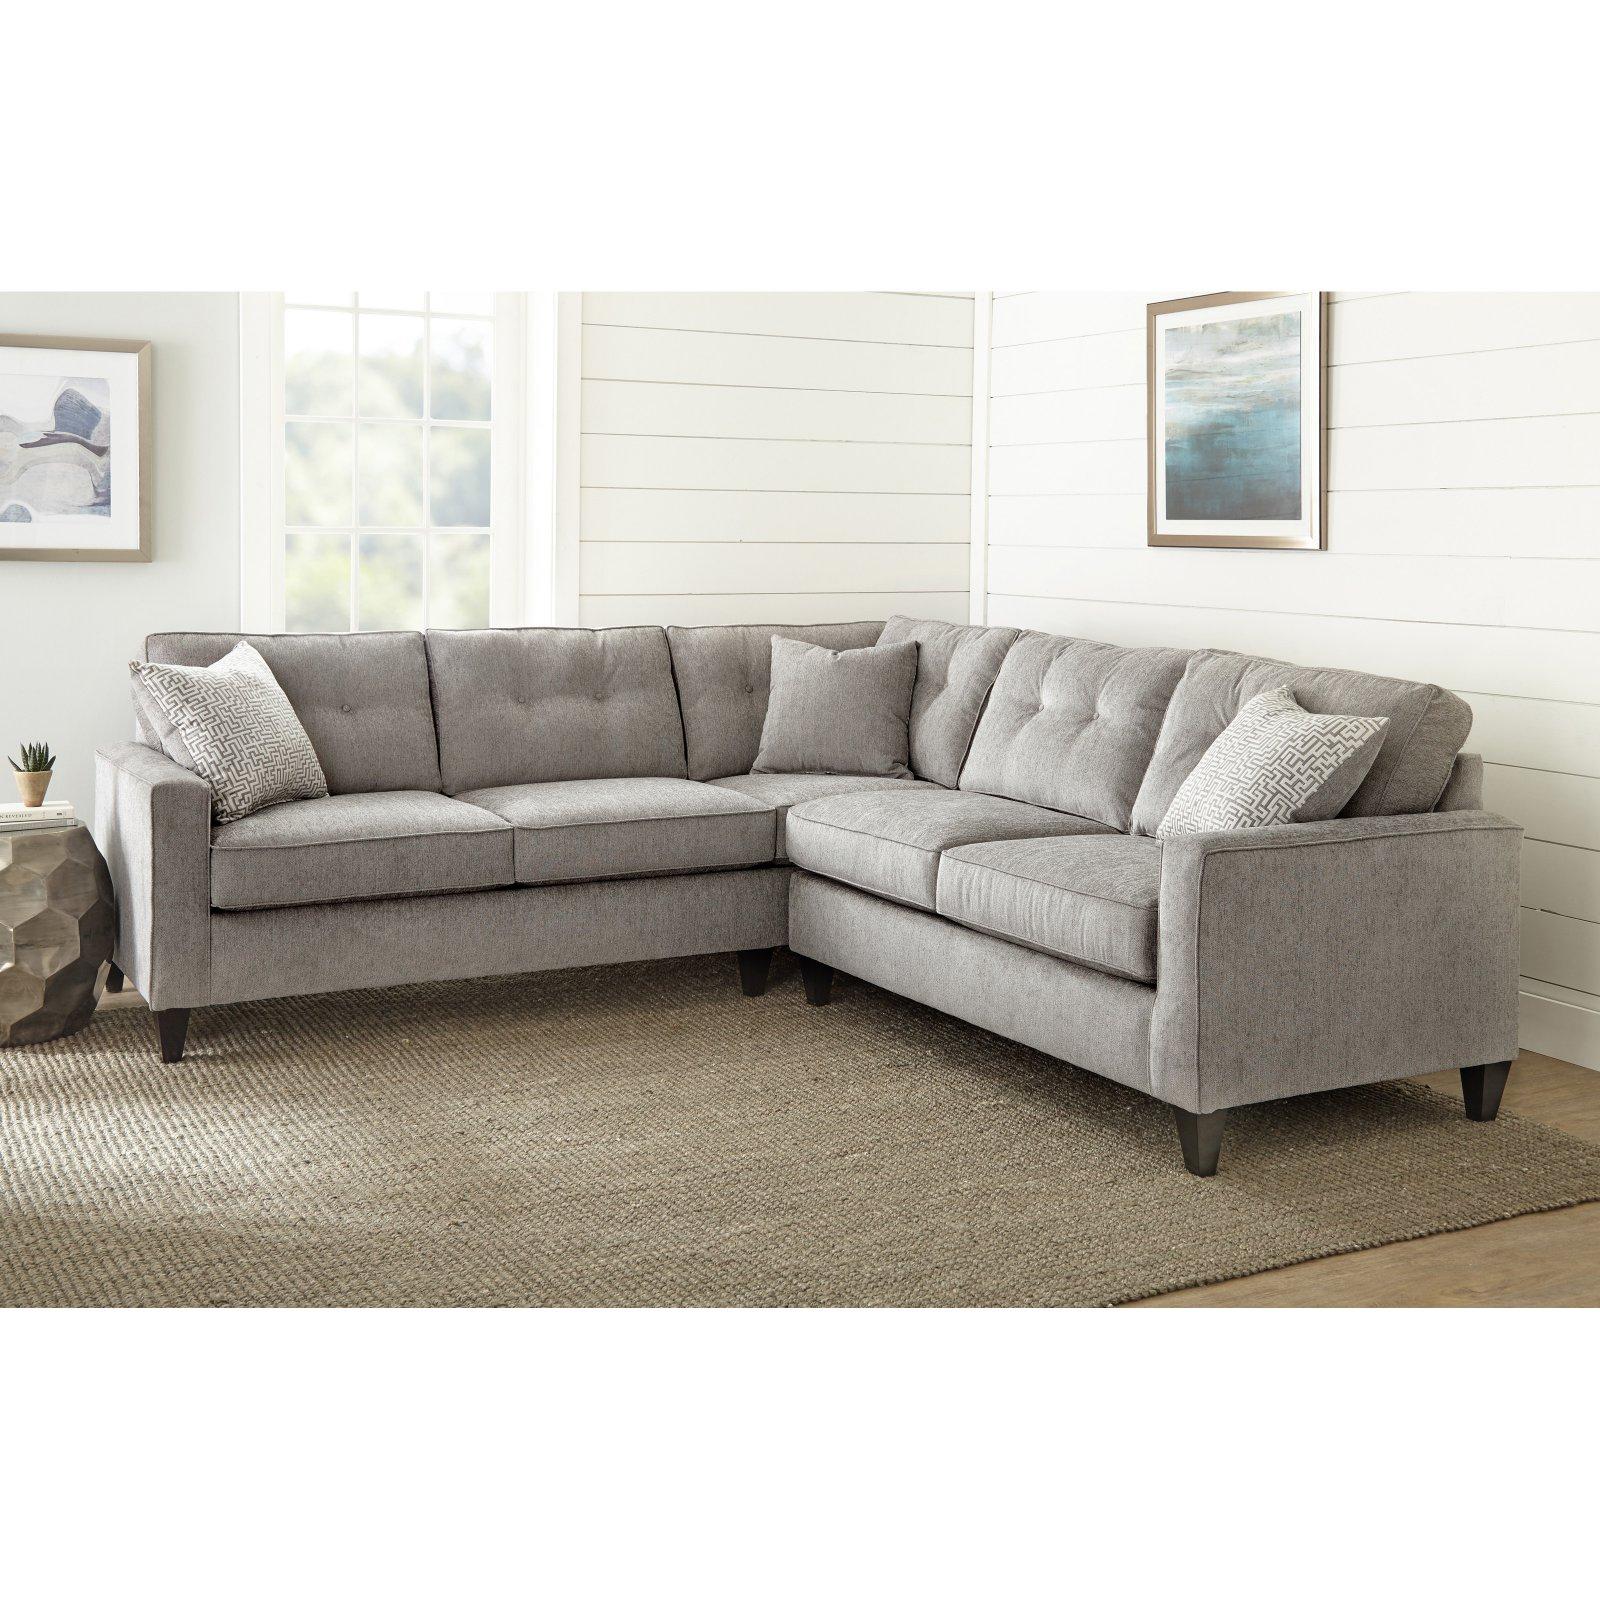 Steve Silver Co. Maddox Sectional Sofa